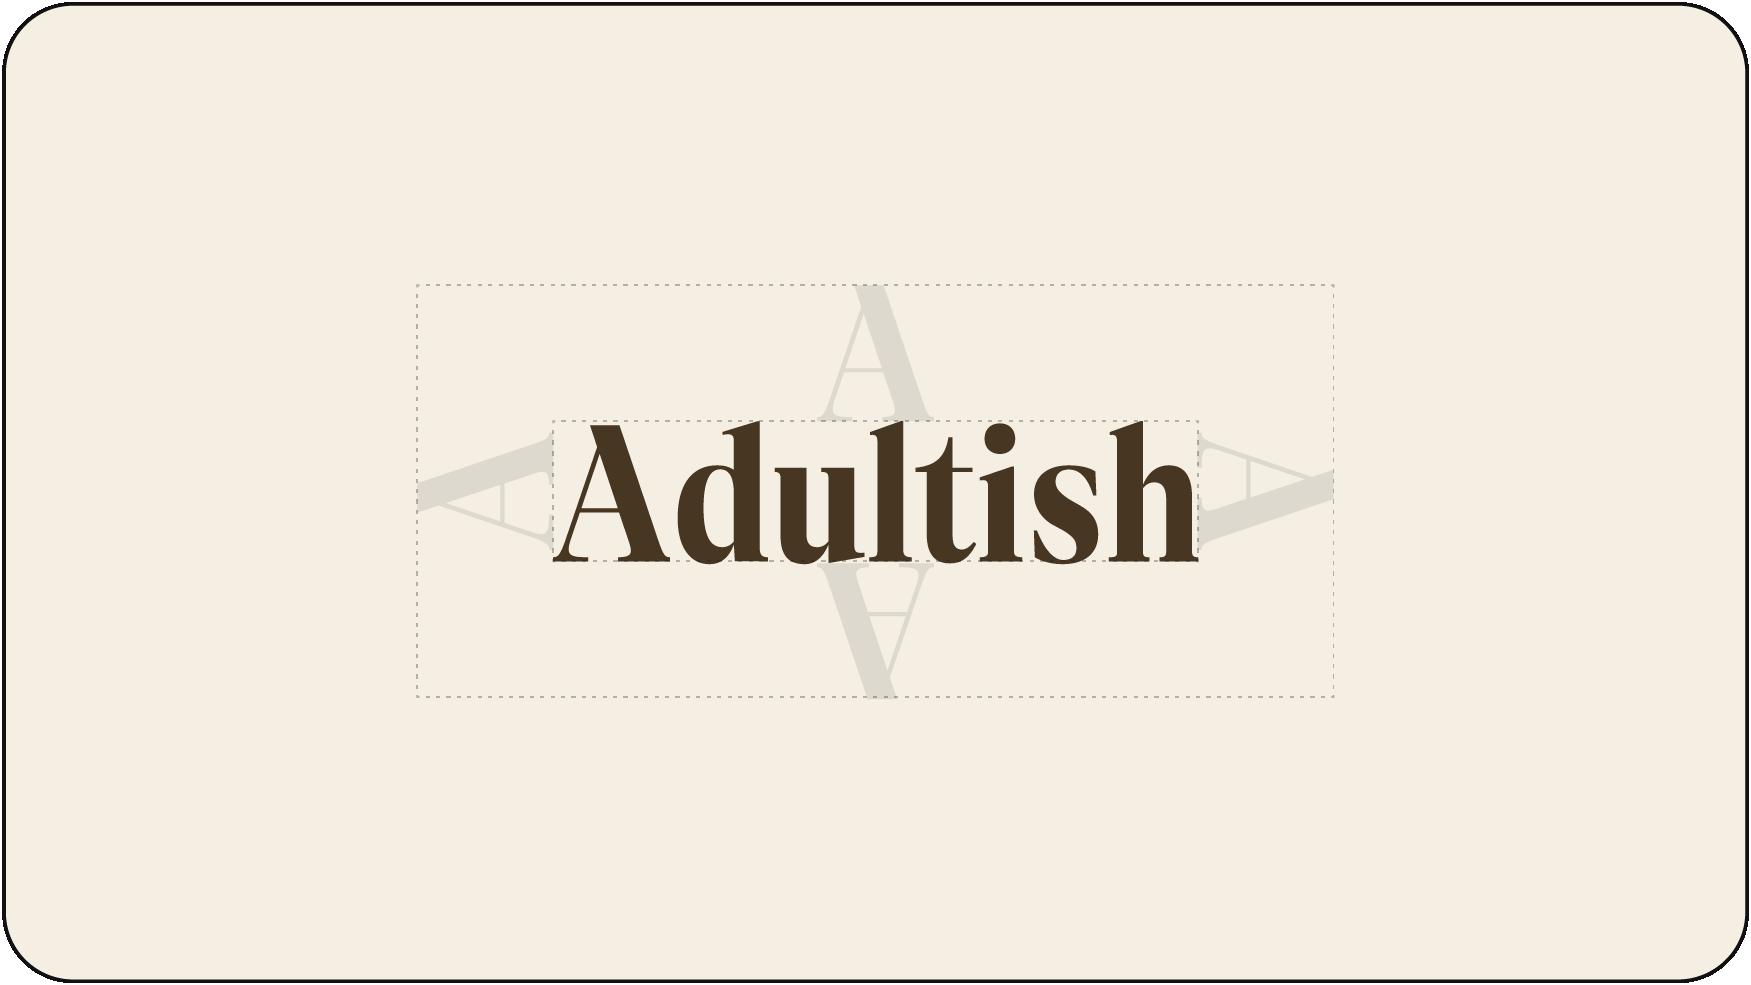 Adultish_B-3